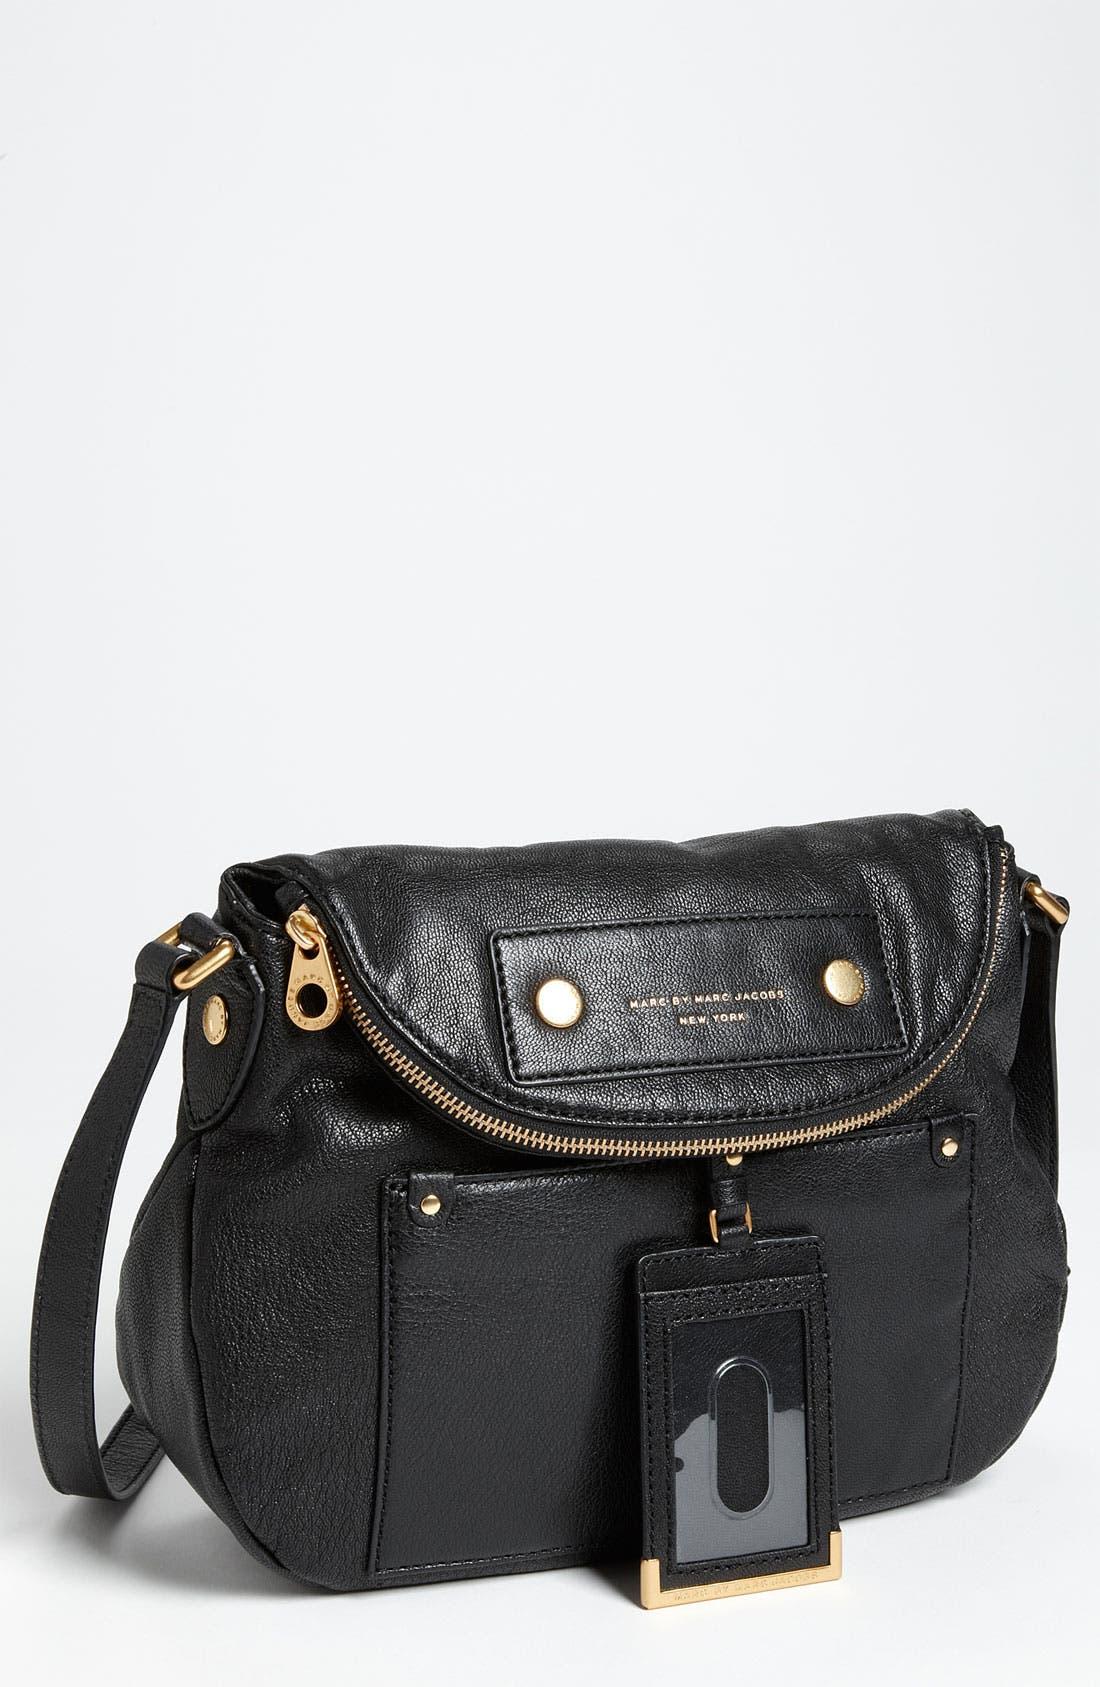 Main Image - MARC BY MARC JACOBS 'Preppy Natasha' Leather Crossbody Bag